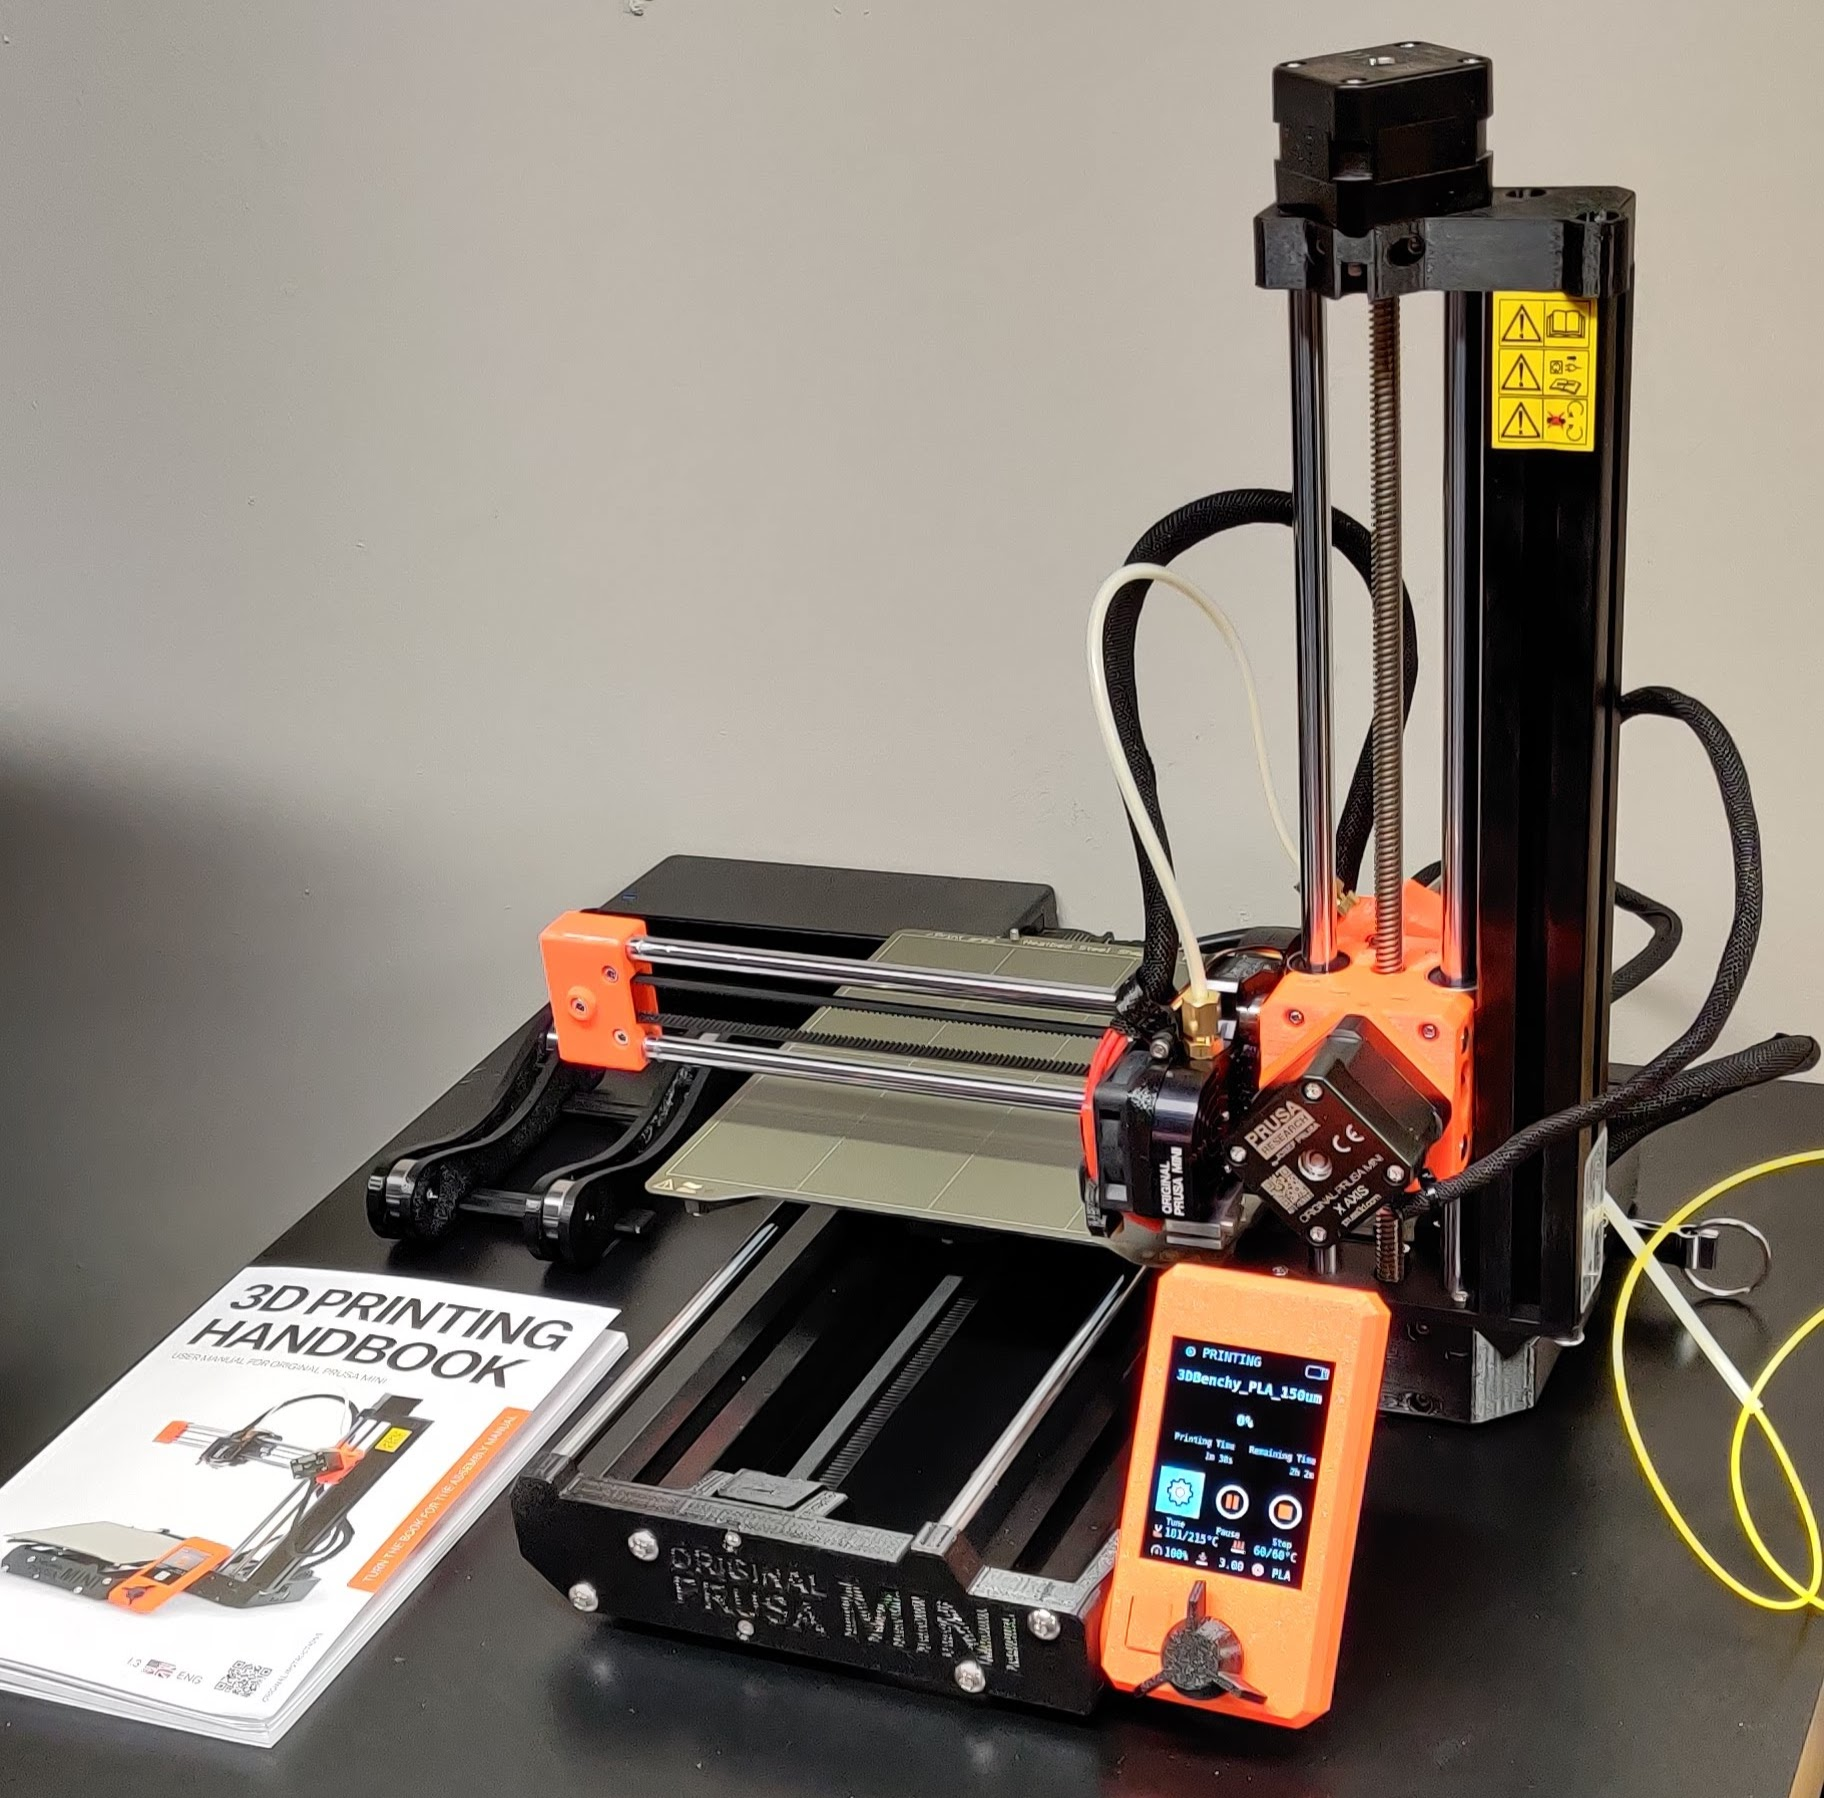 Prusa Mini 3D Printing